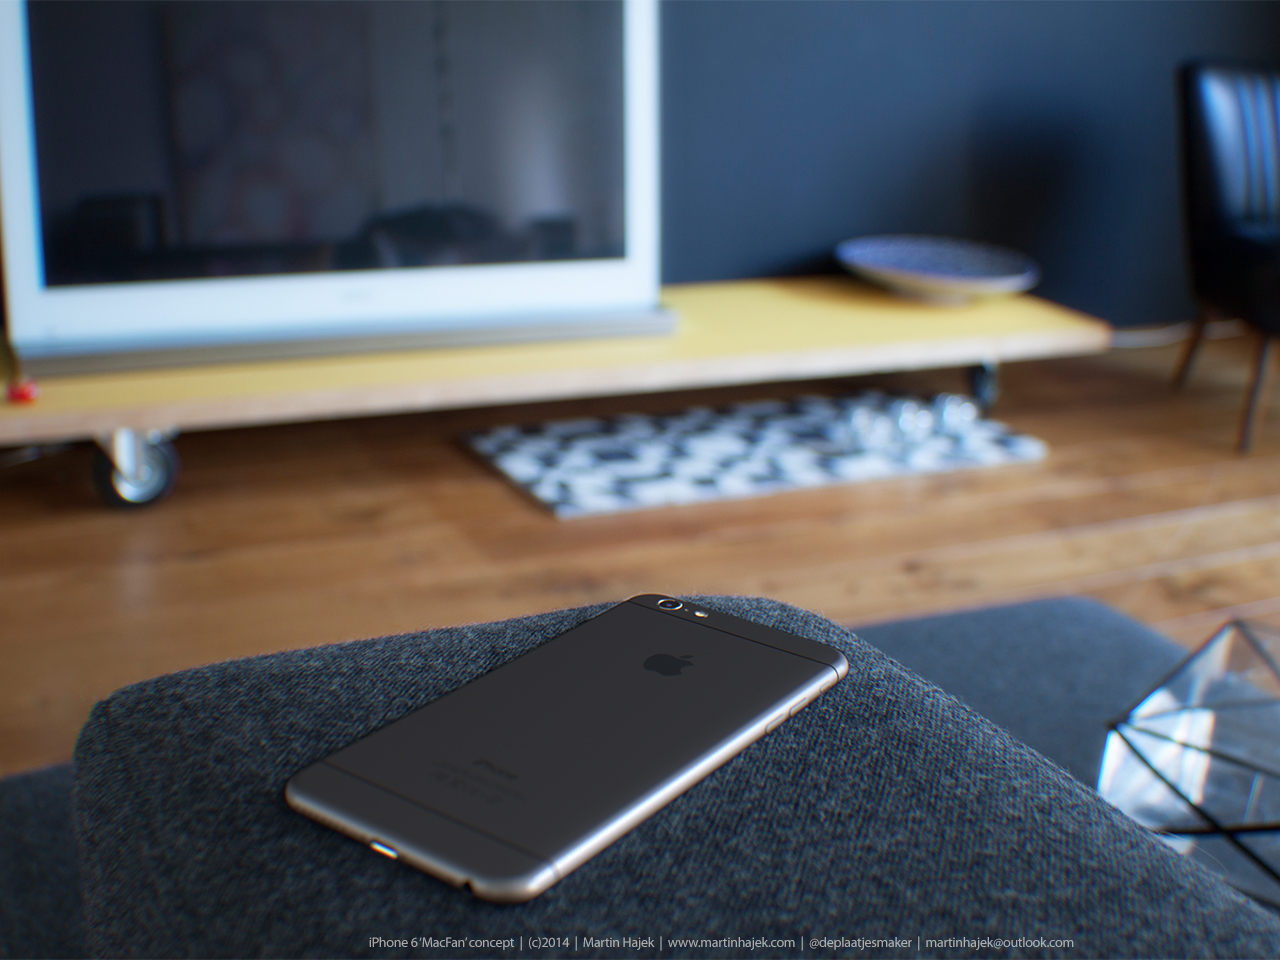 upgrade to iPhone 6